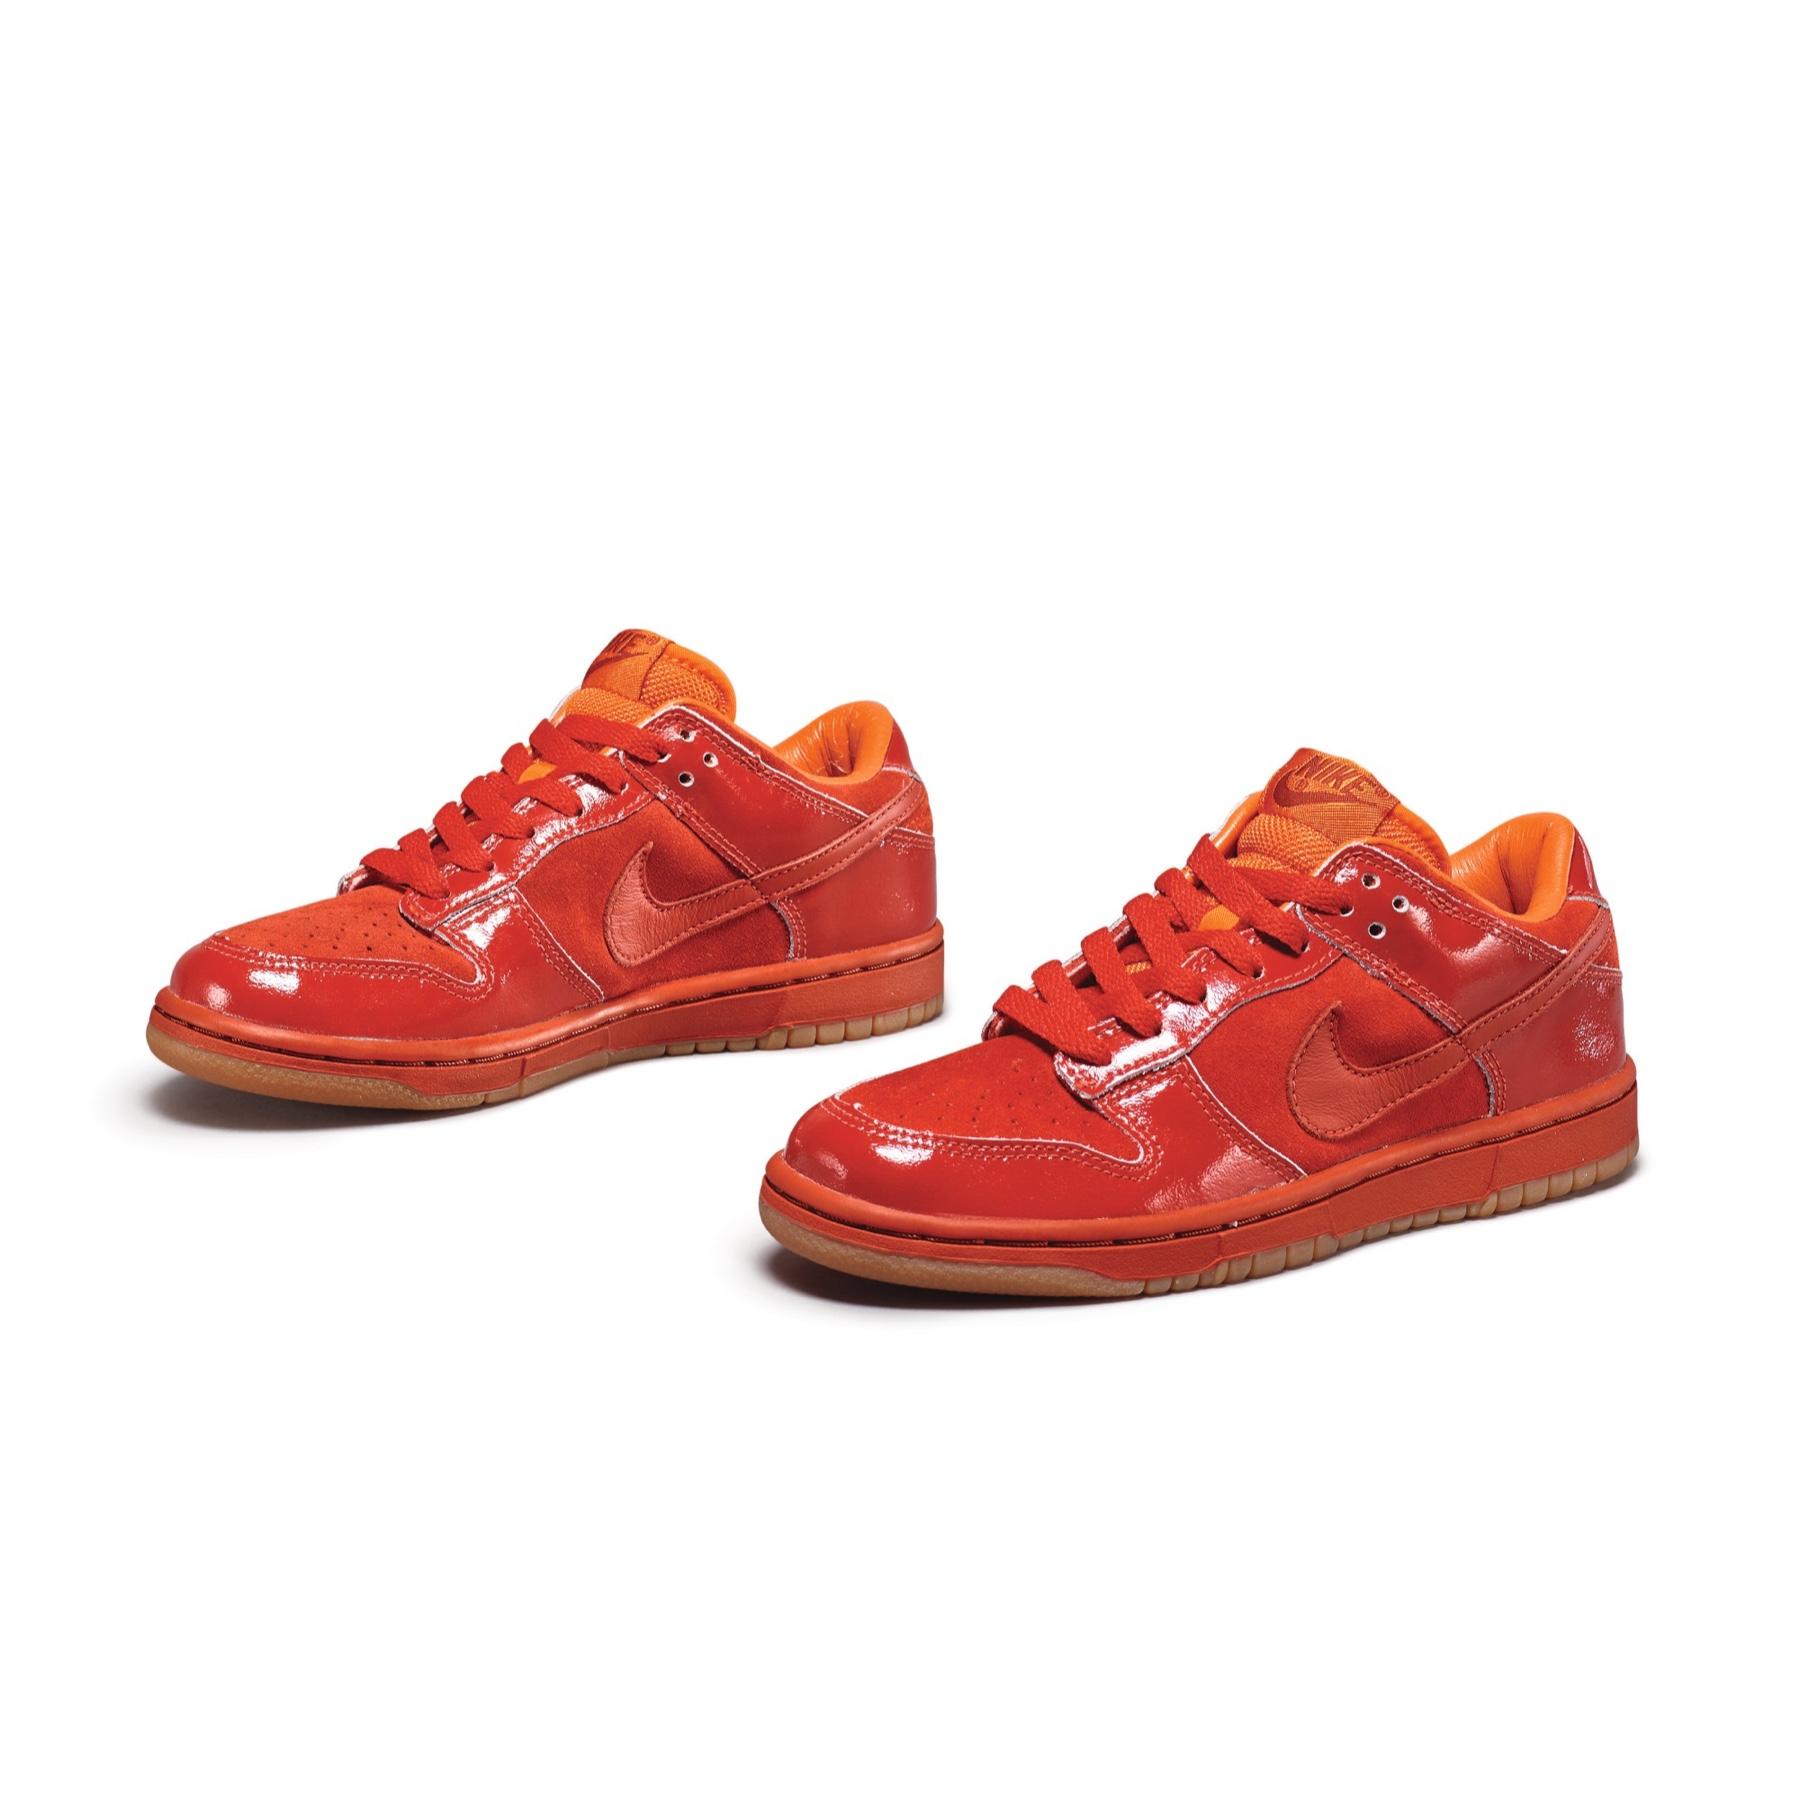 Katsuya Terada x Nike SB Dunk Low